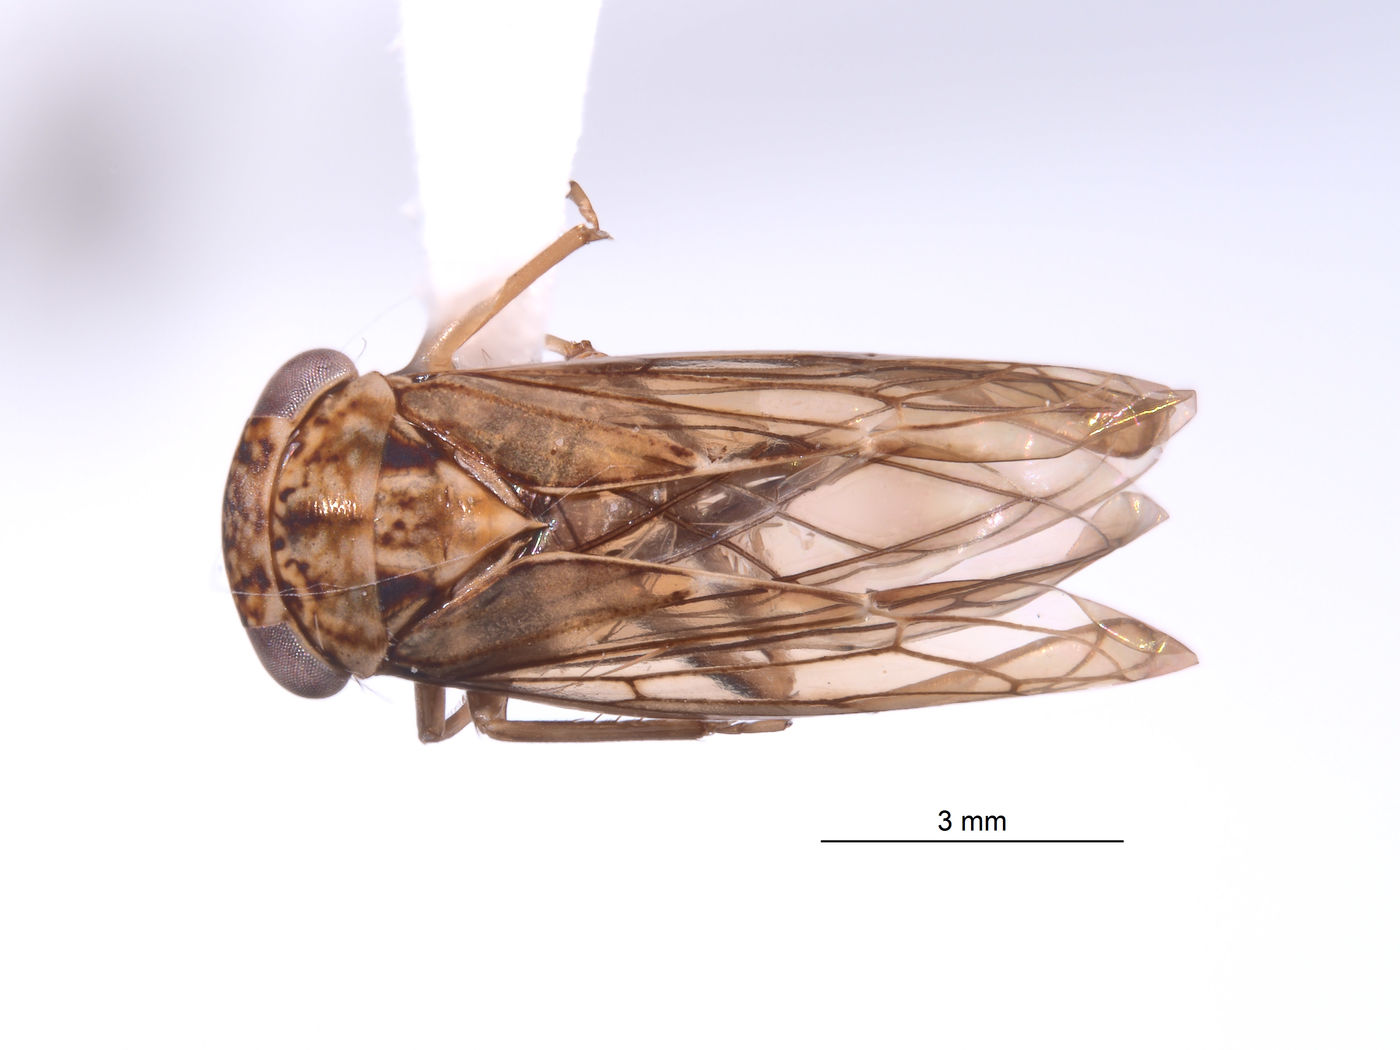 Nesocerus brevipinguis image